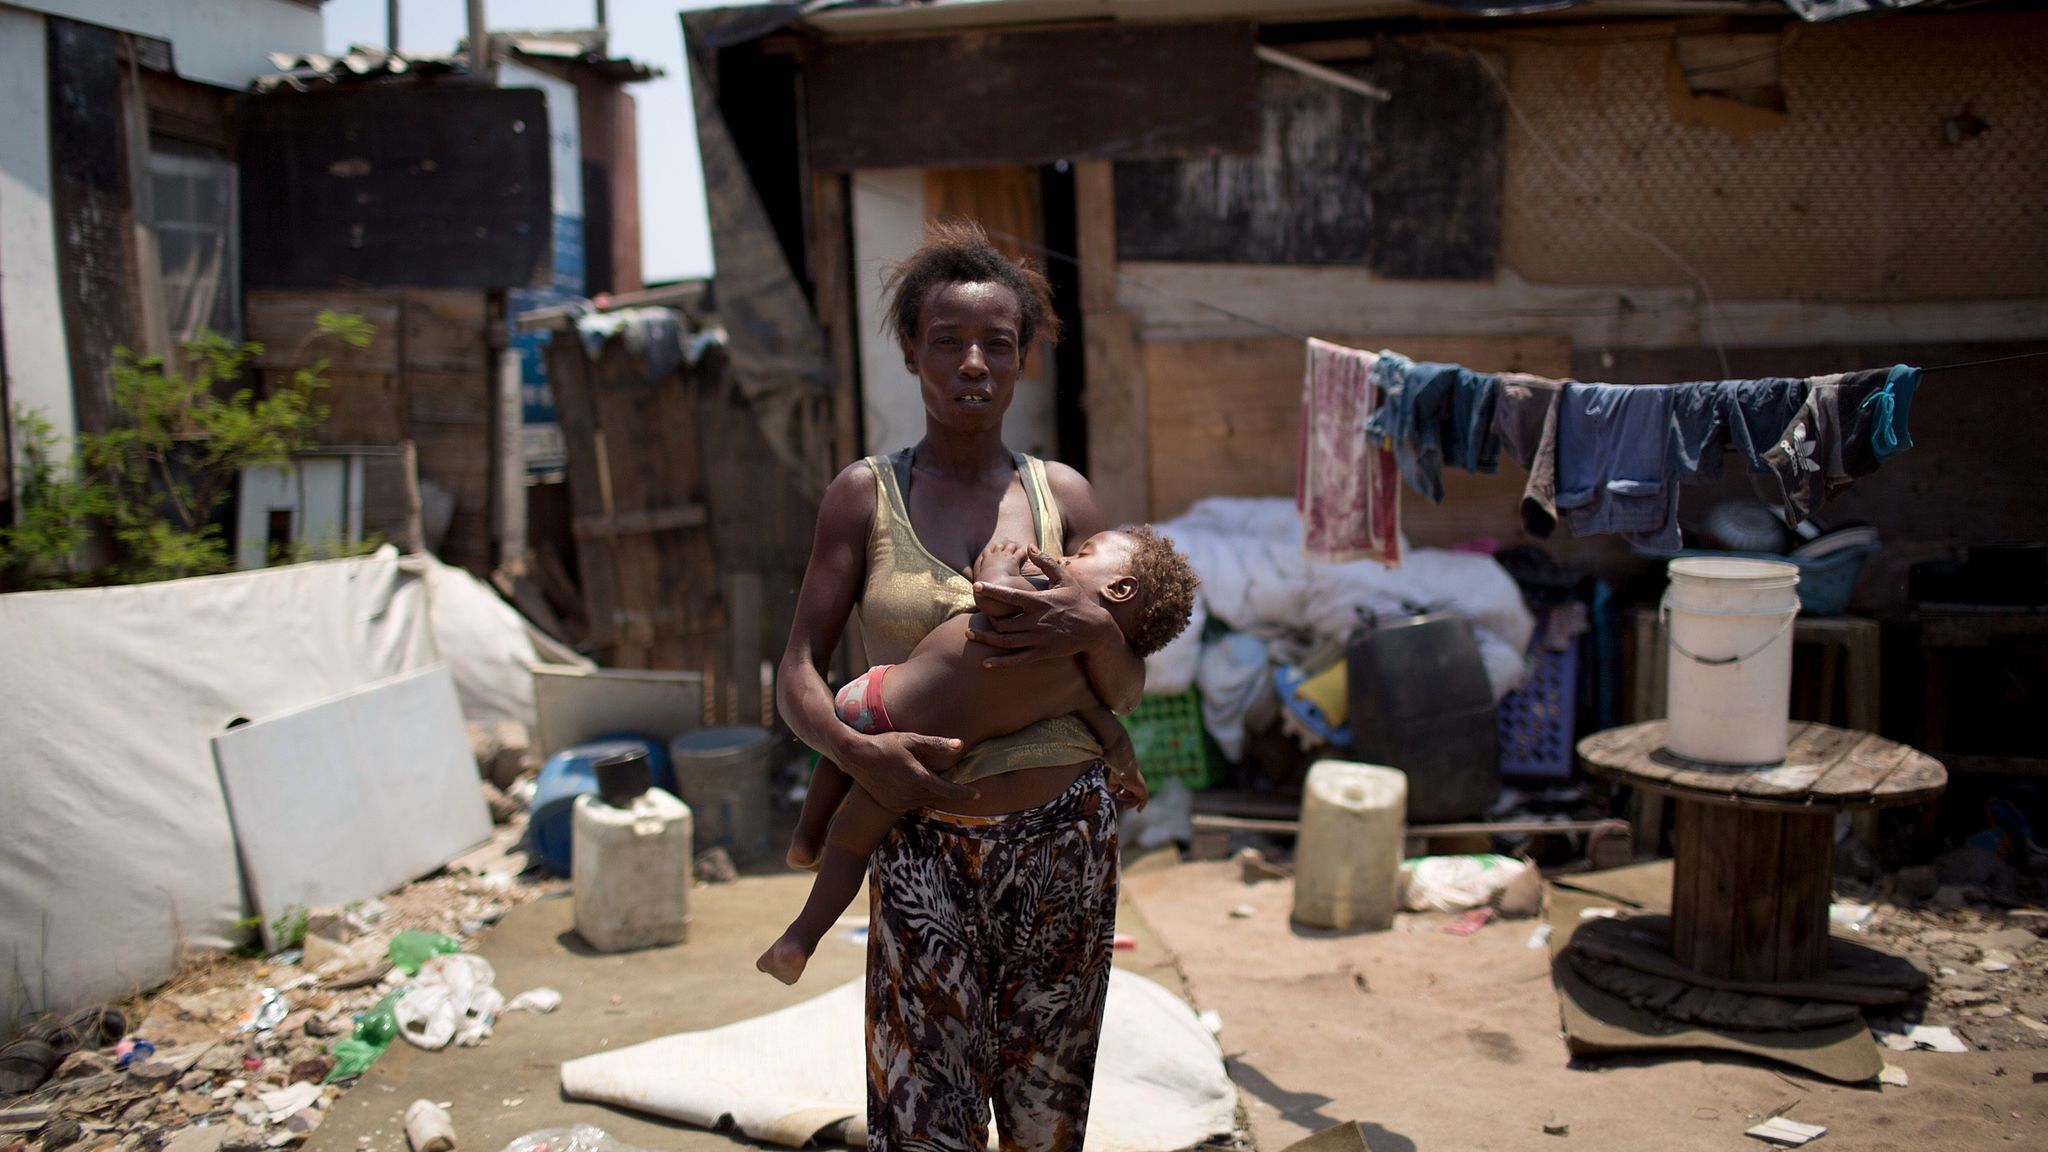 La pobreza se posa en Brasil - Hoy Chicago